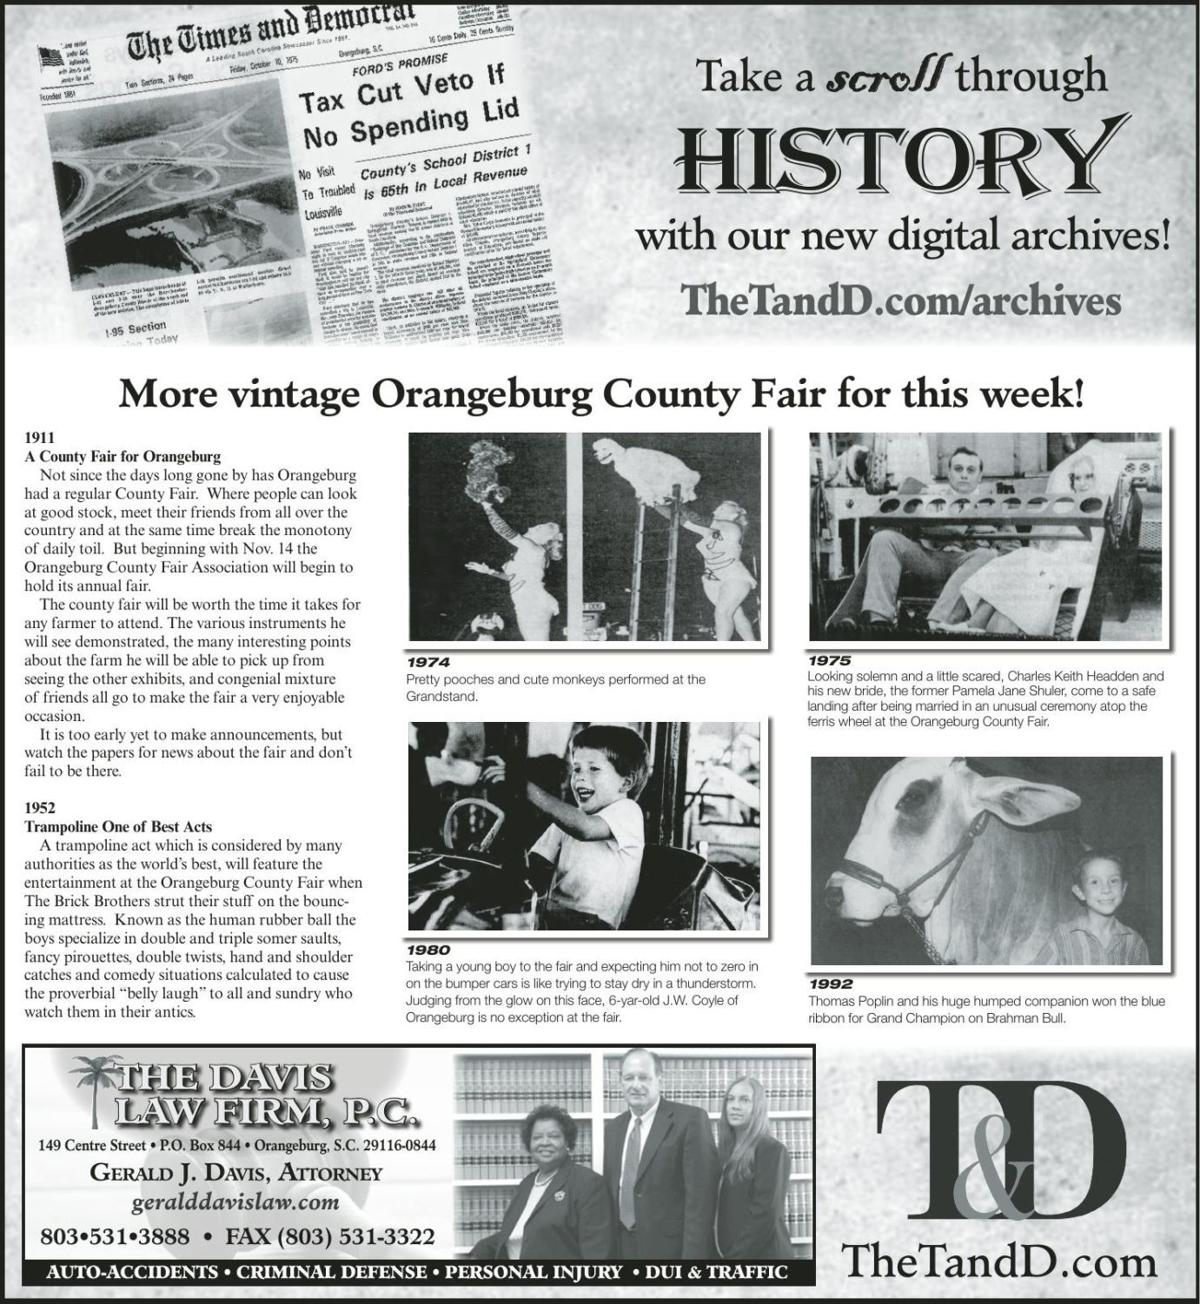 TheTandD.com/archives Oct. 6, 2019